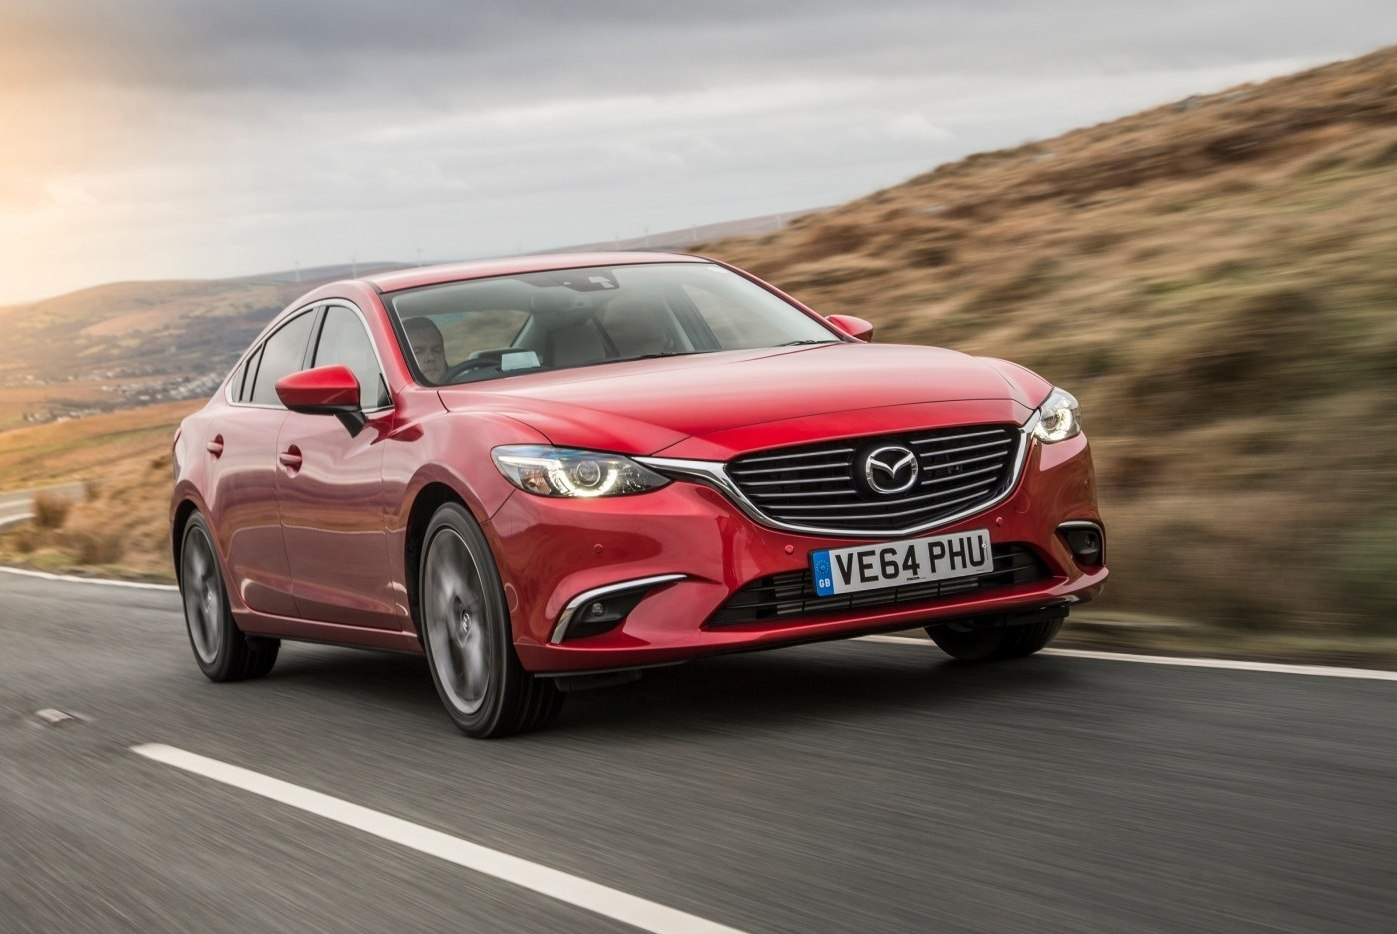 Продажа и сервис автомобилей Mazda